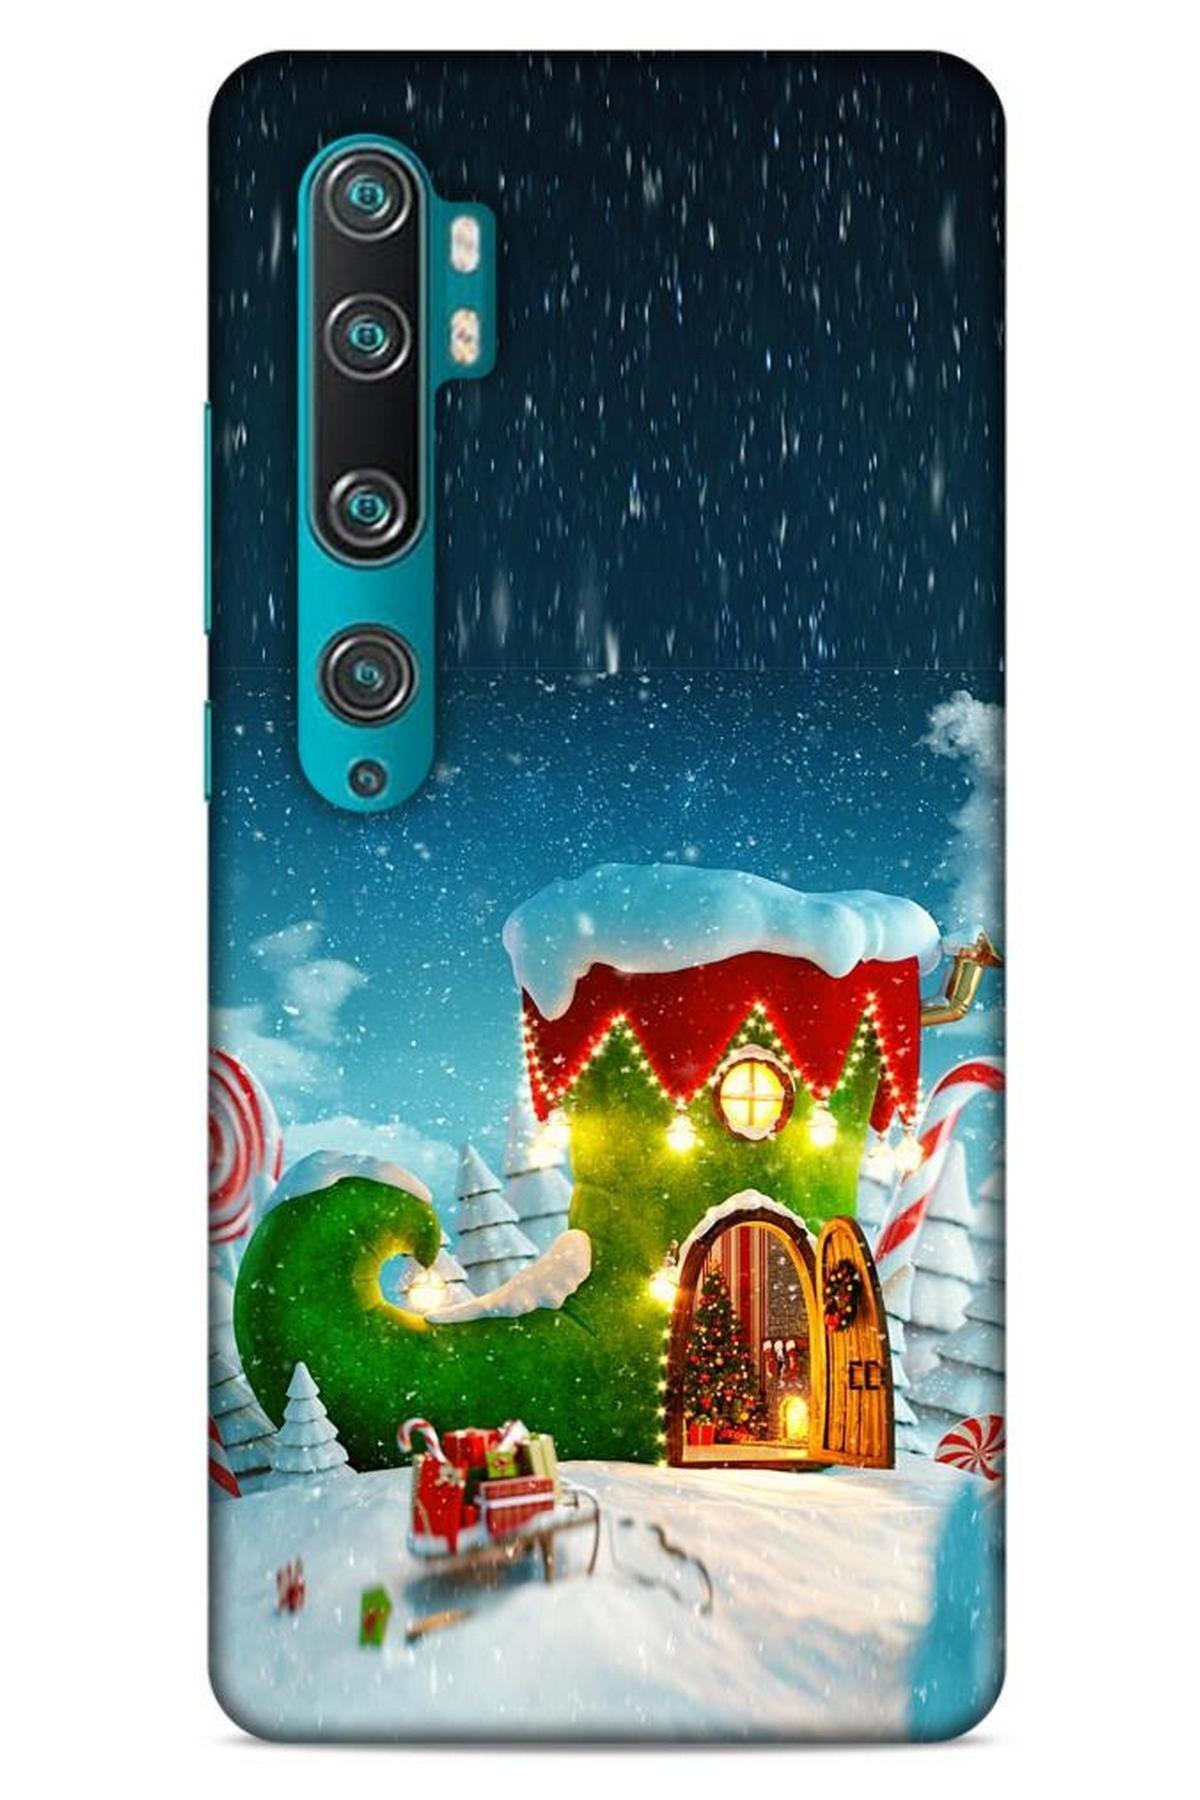 Lopard Xiaomi Mi Note 10 Pro Kılıf Snowix (4) Koruma Kılıfı Yeşil Lacivert 1